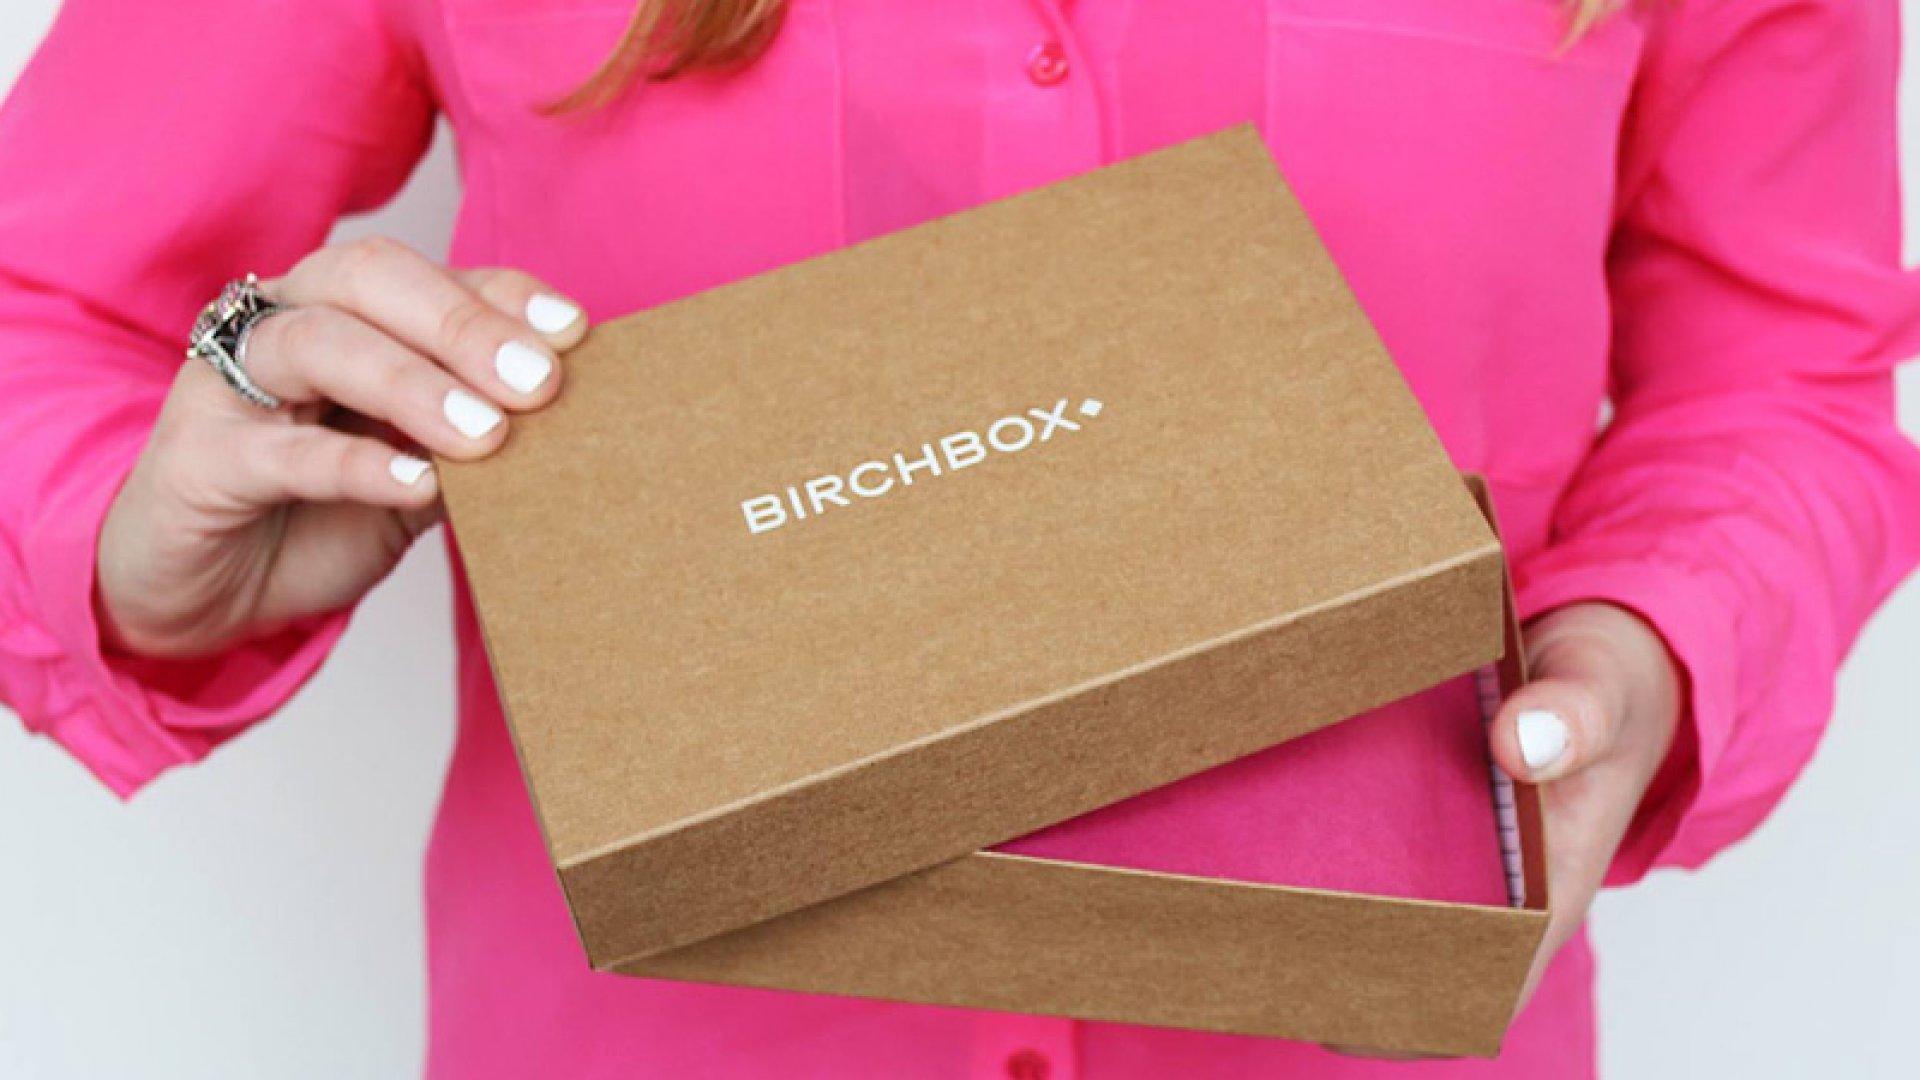 Birchbox Cuts 30 More Employees